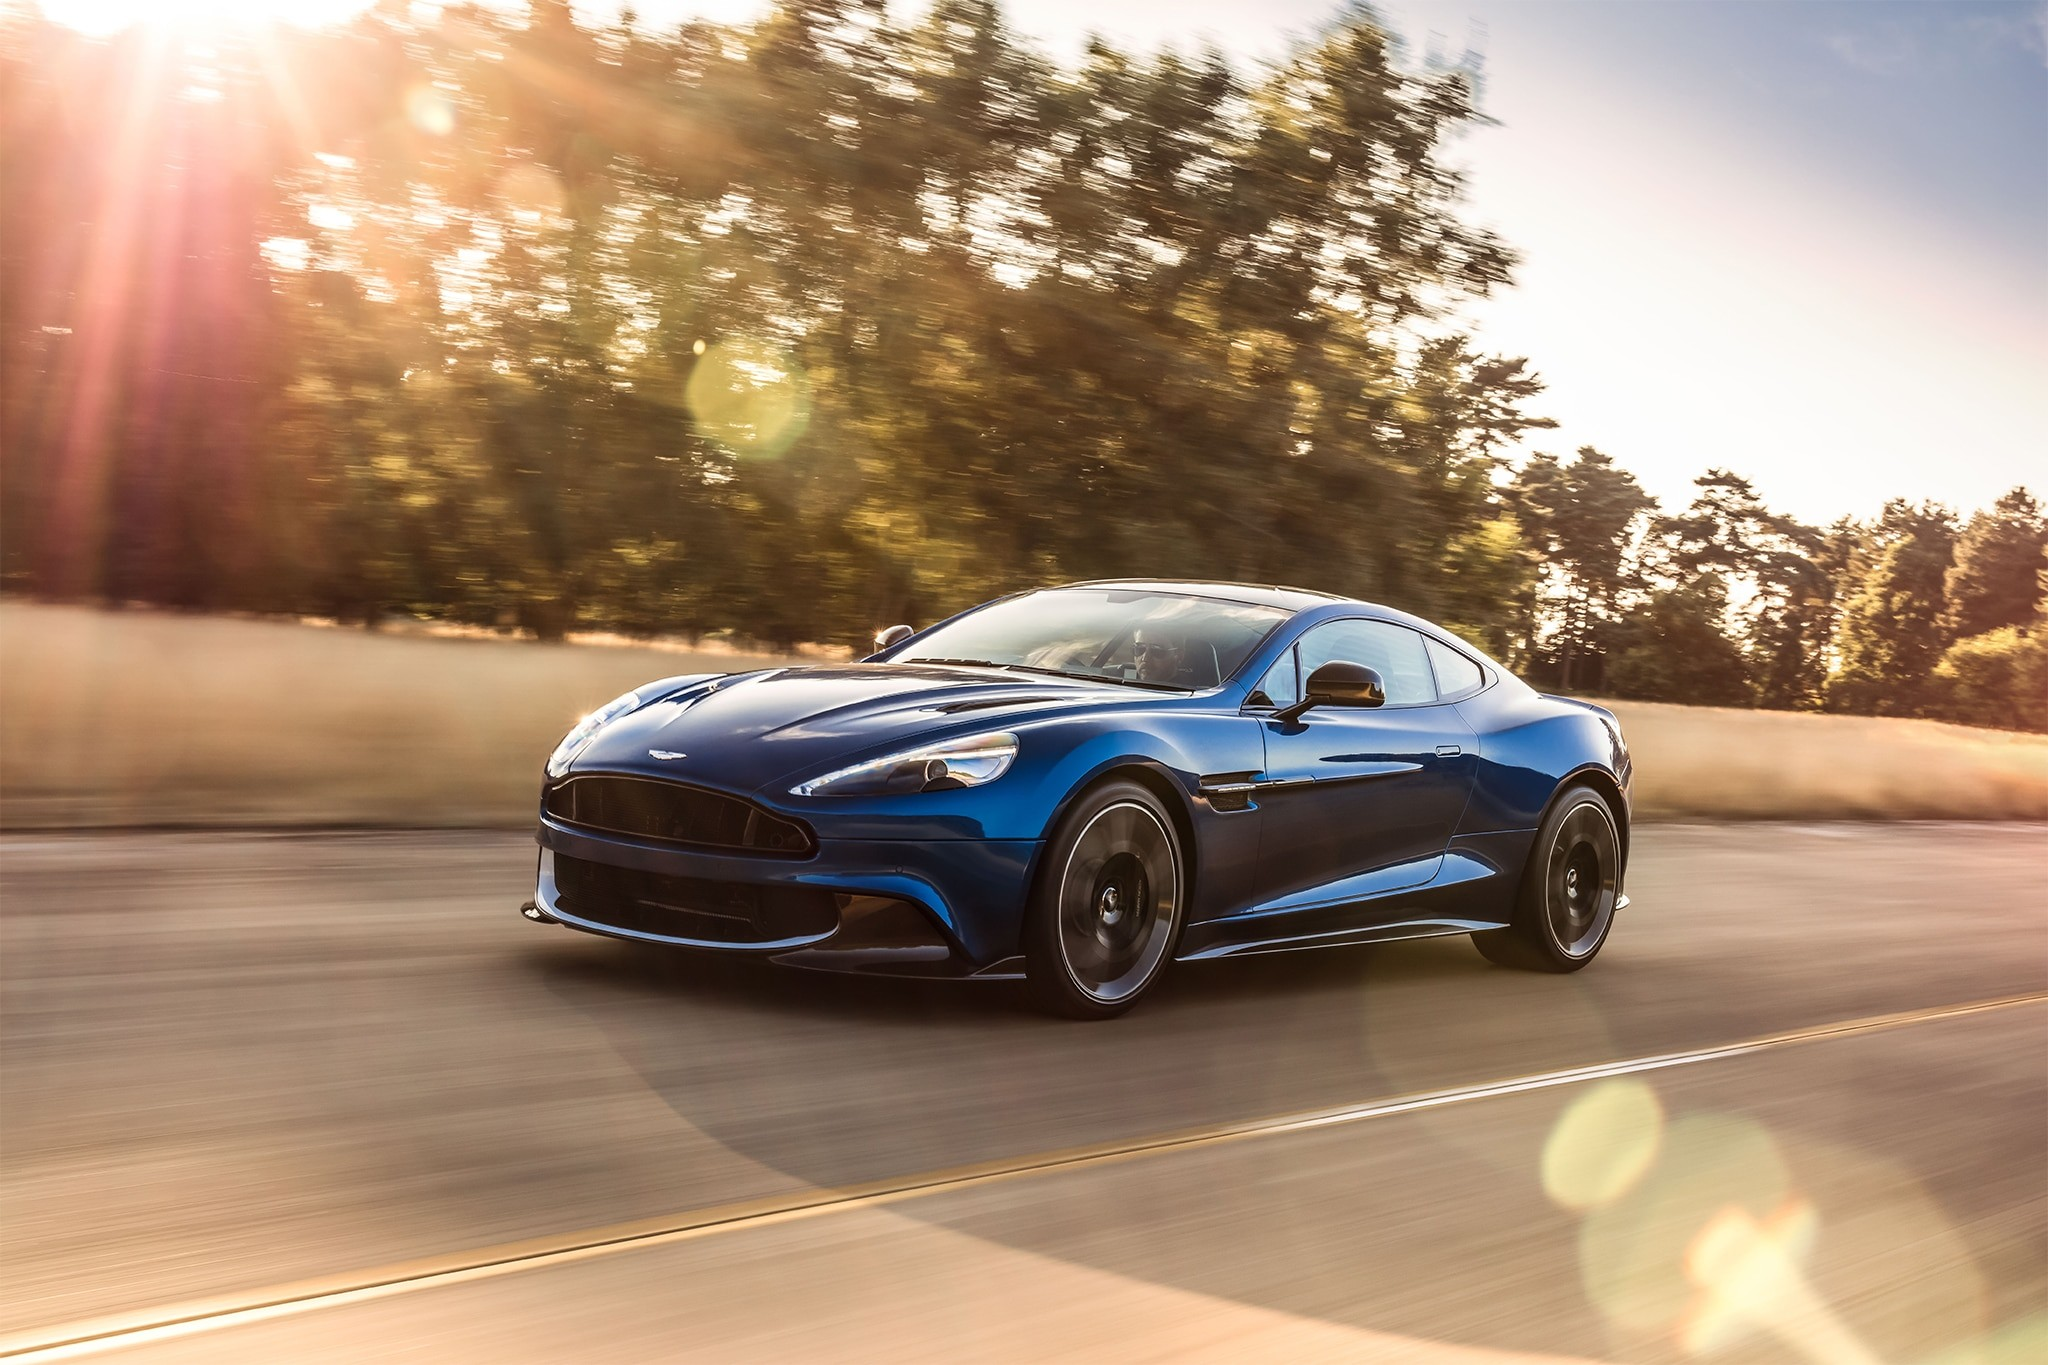 Aston Martin Vanquish 2018 Wallpaper 62 Images